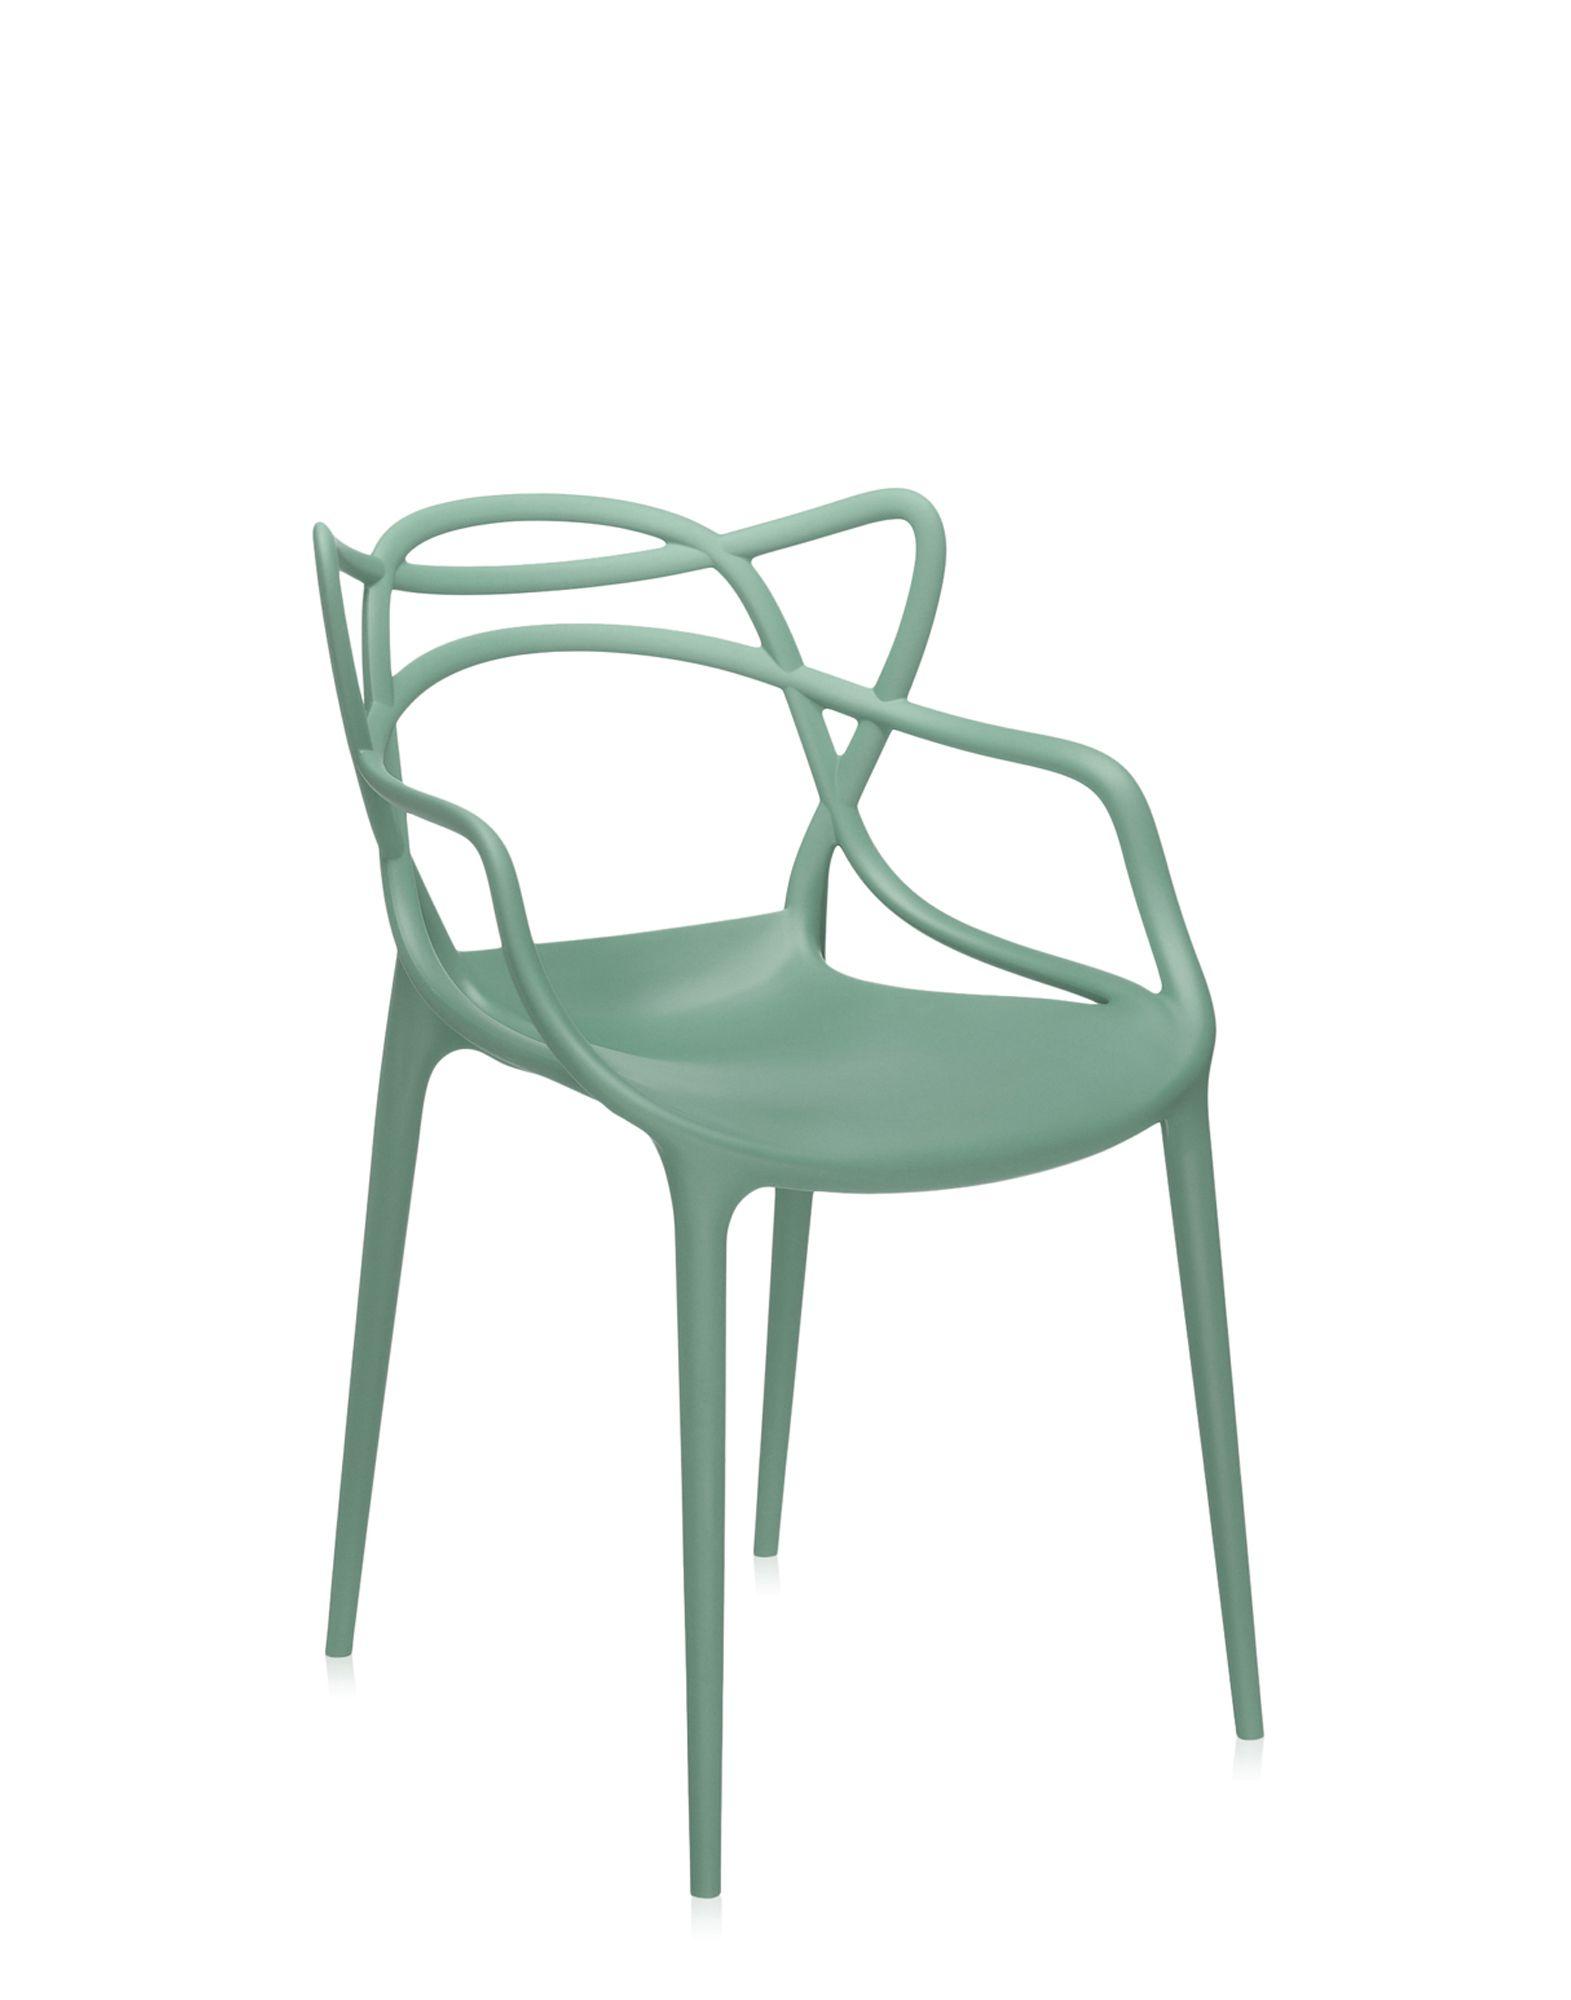 Kartell sedia masters verde salvia kartell sedie design for Sedia design kartell